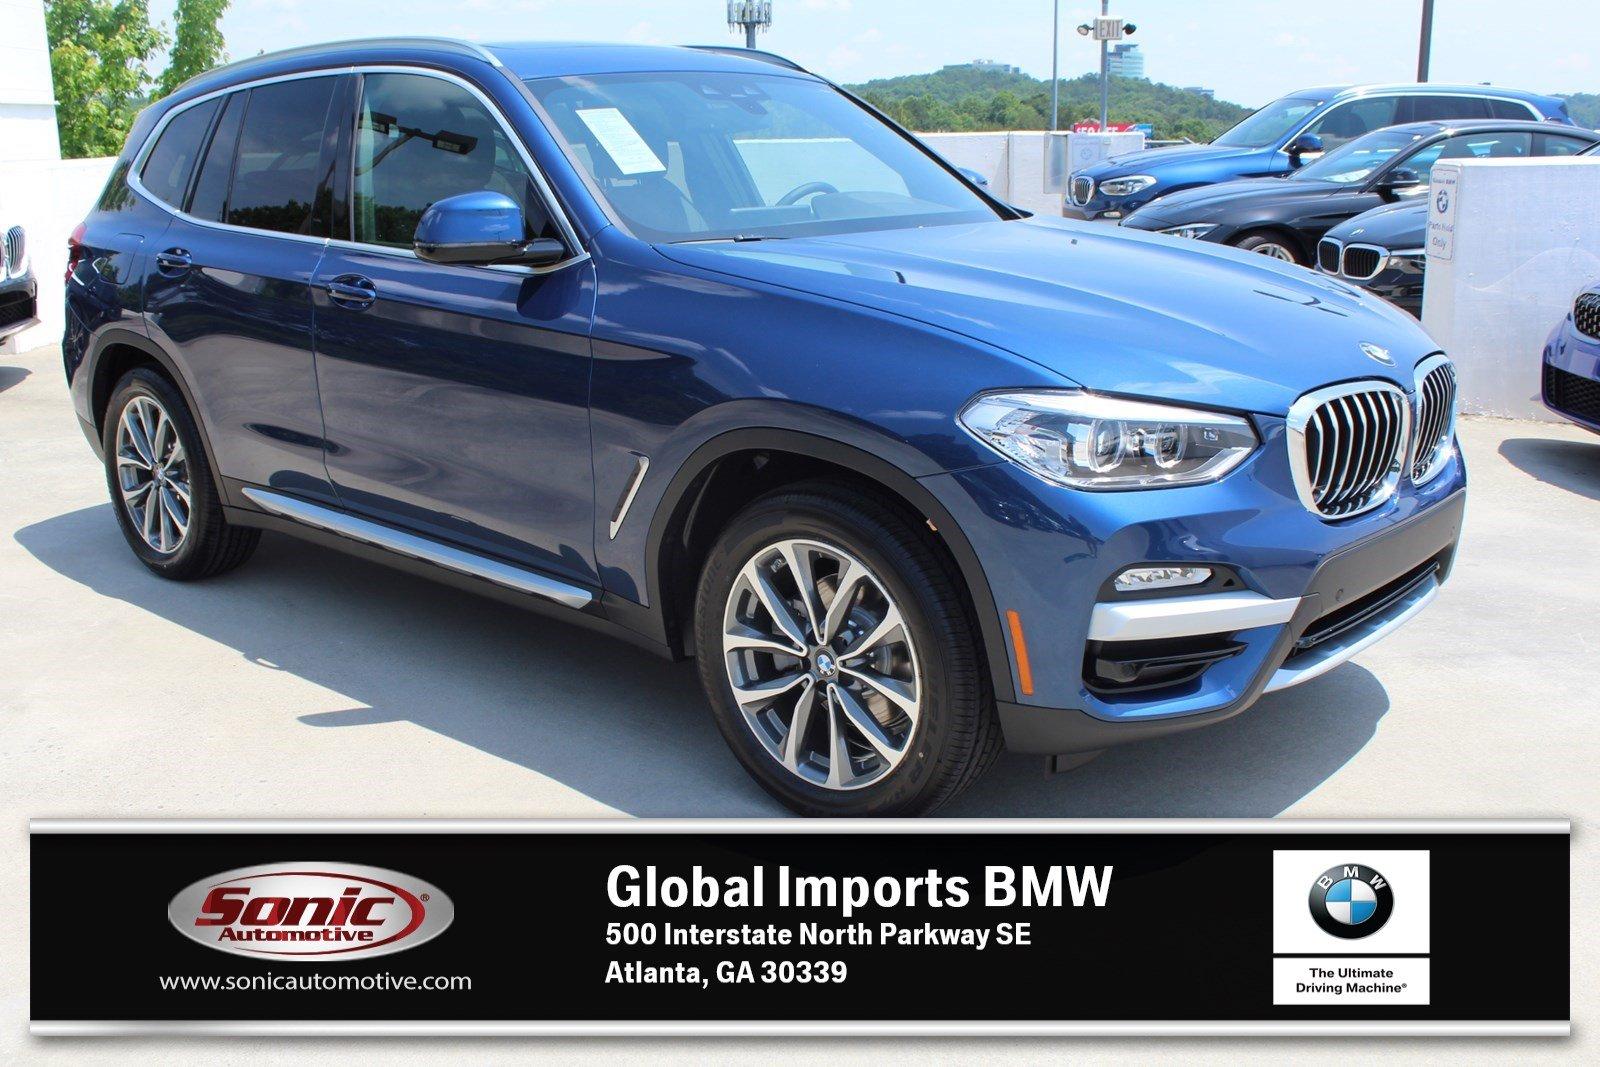 used BMW X3 2019 vin: 5UXTR9C55KLP96789